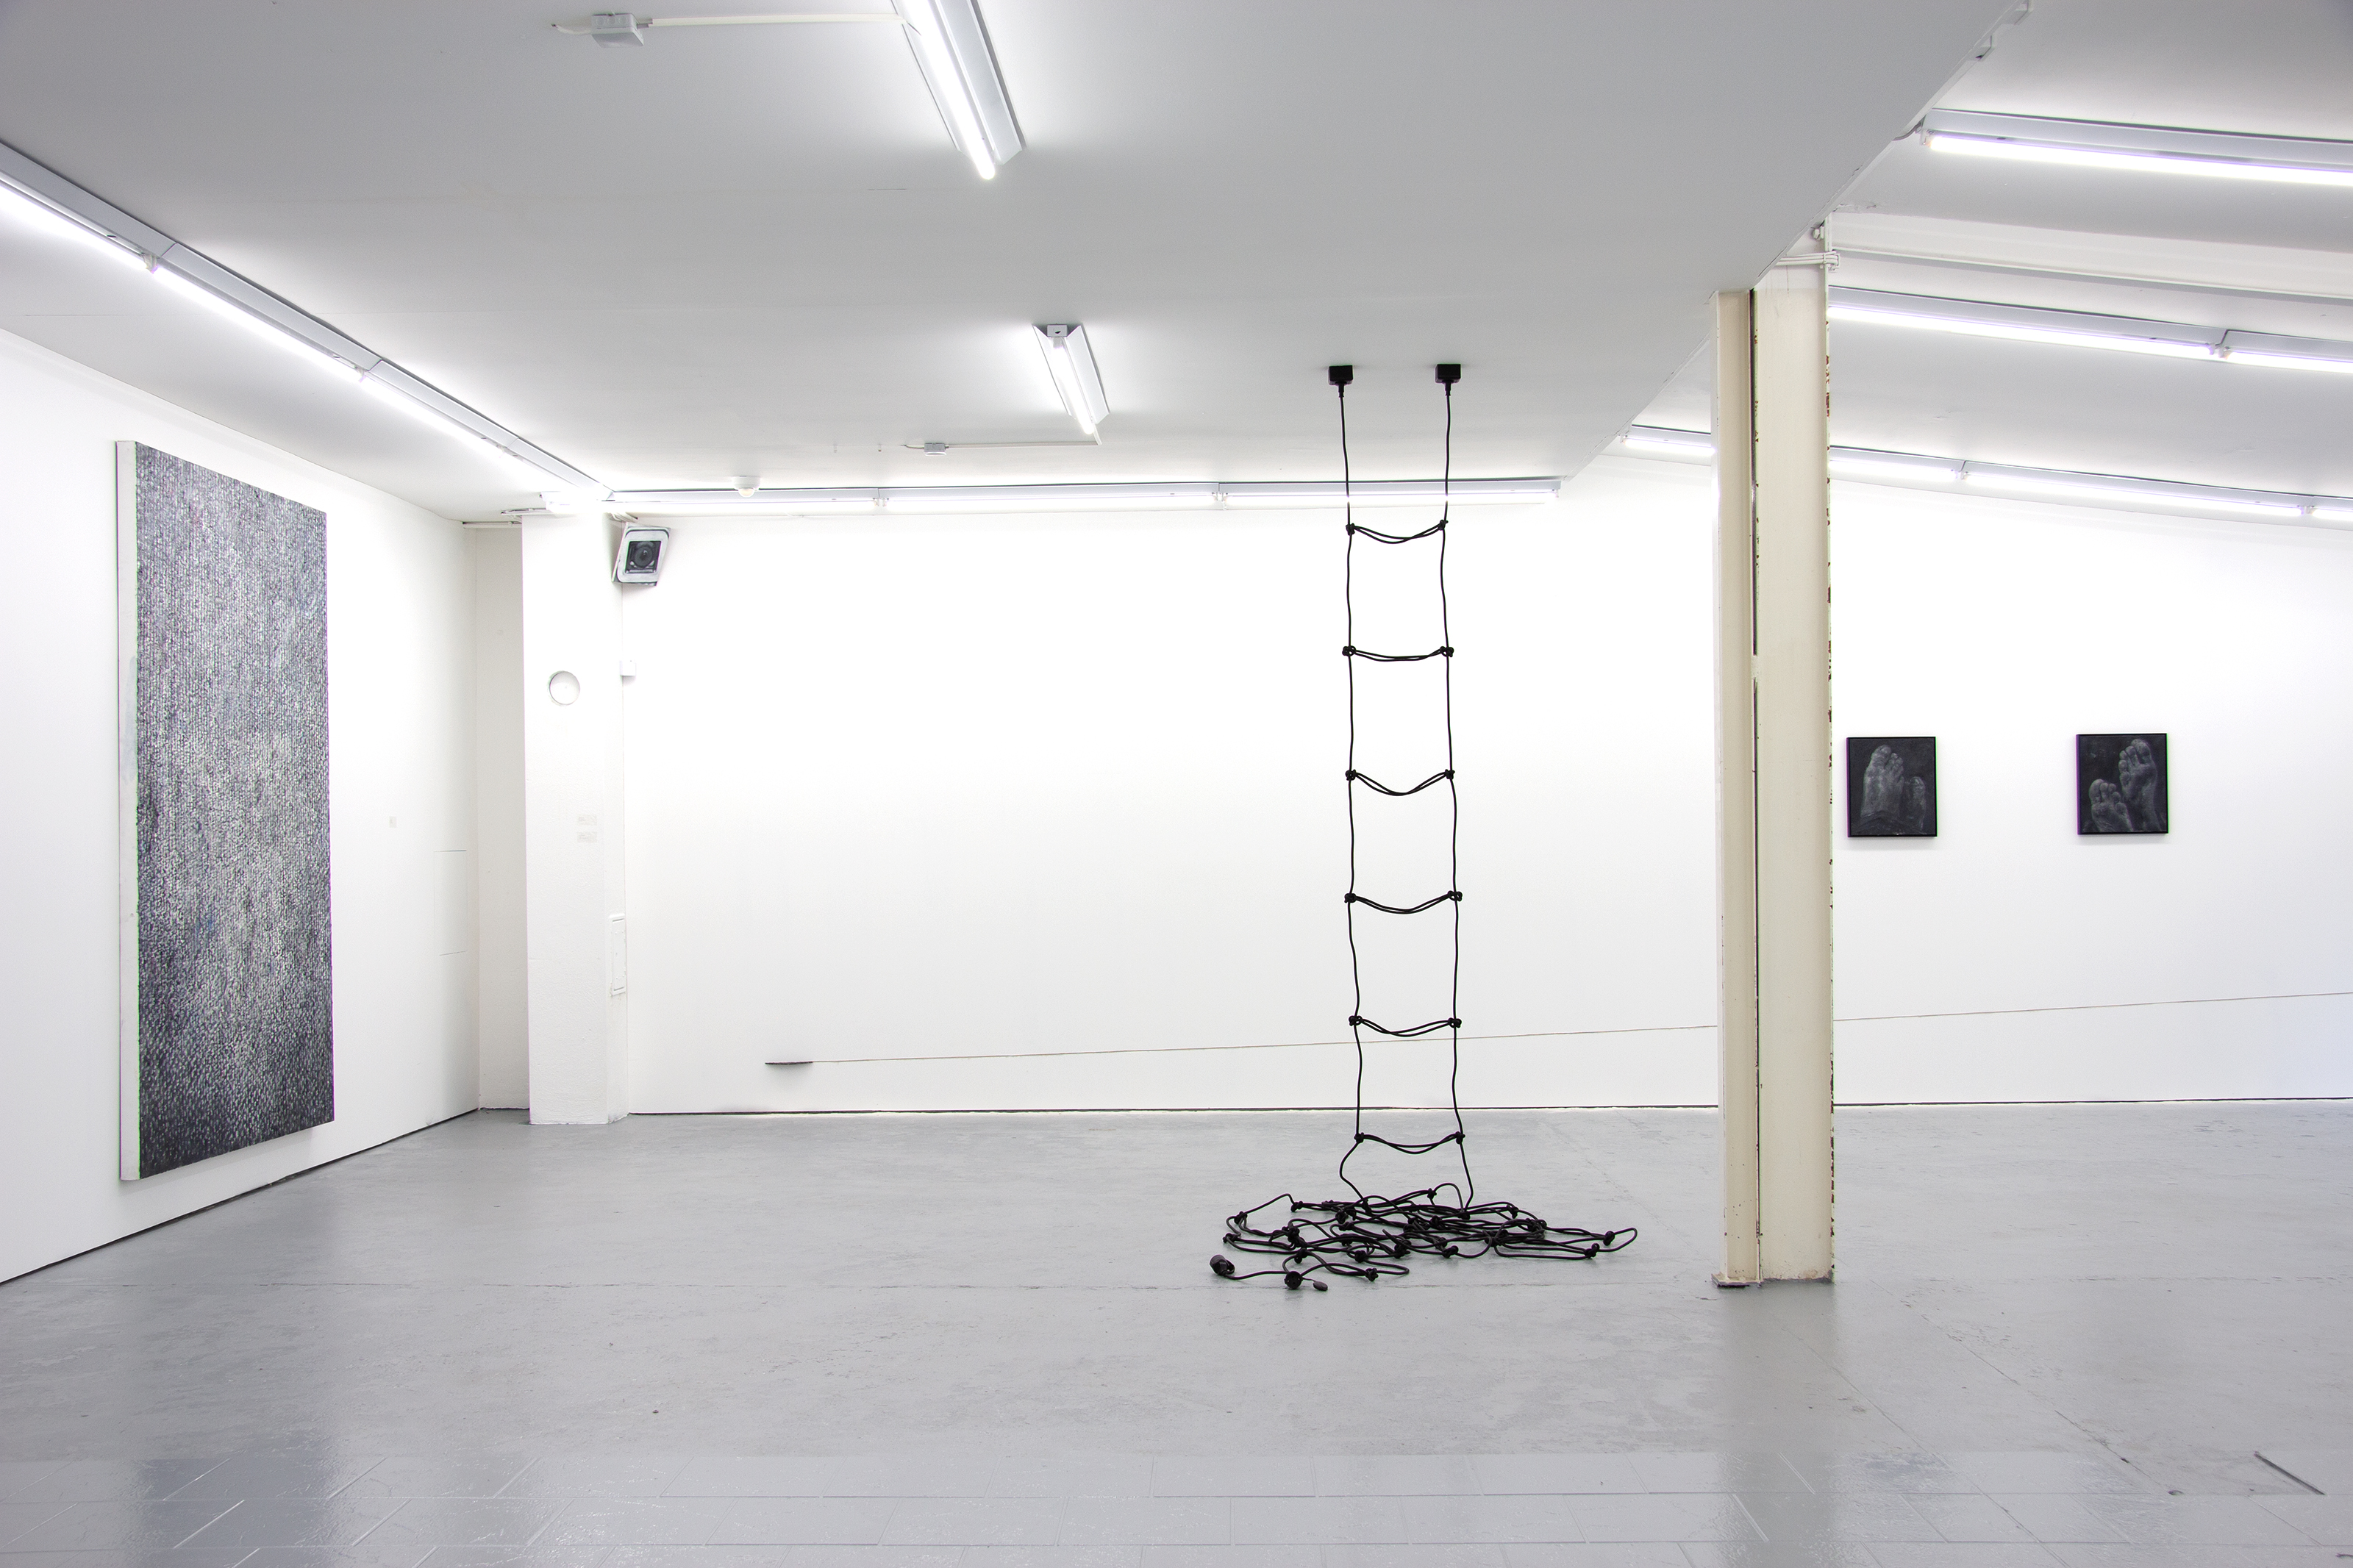 Installation View: Duo Exhibition - Erik Andersen / Lars Teichman - Artworks by Erik Andersen